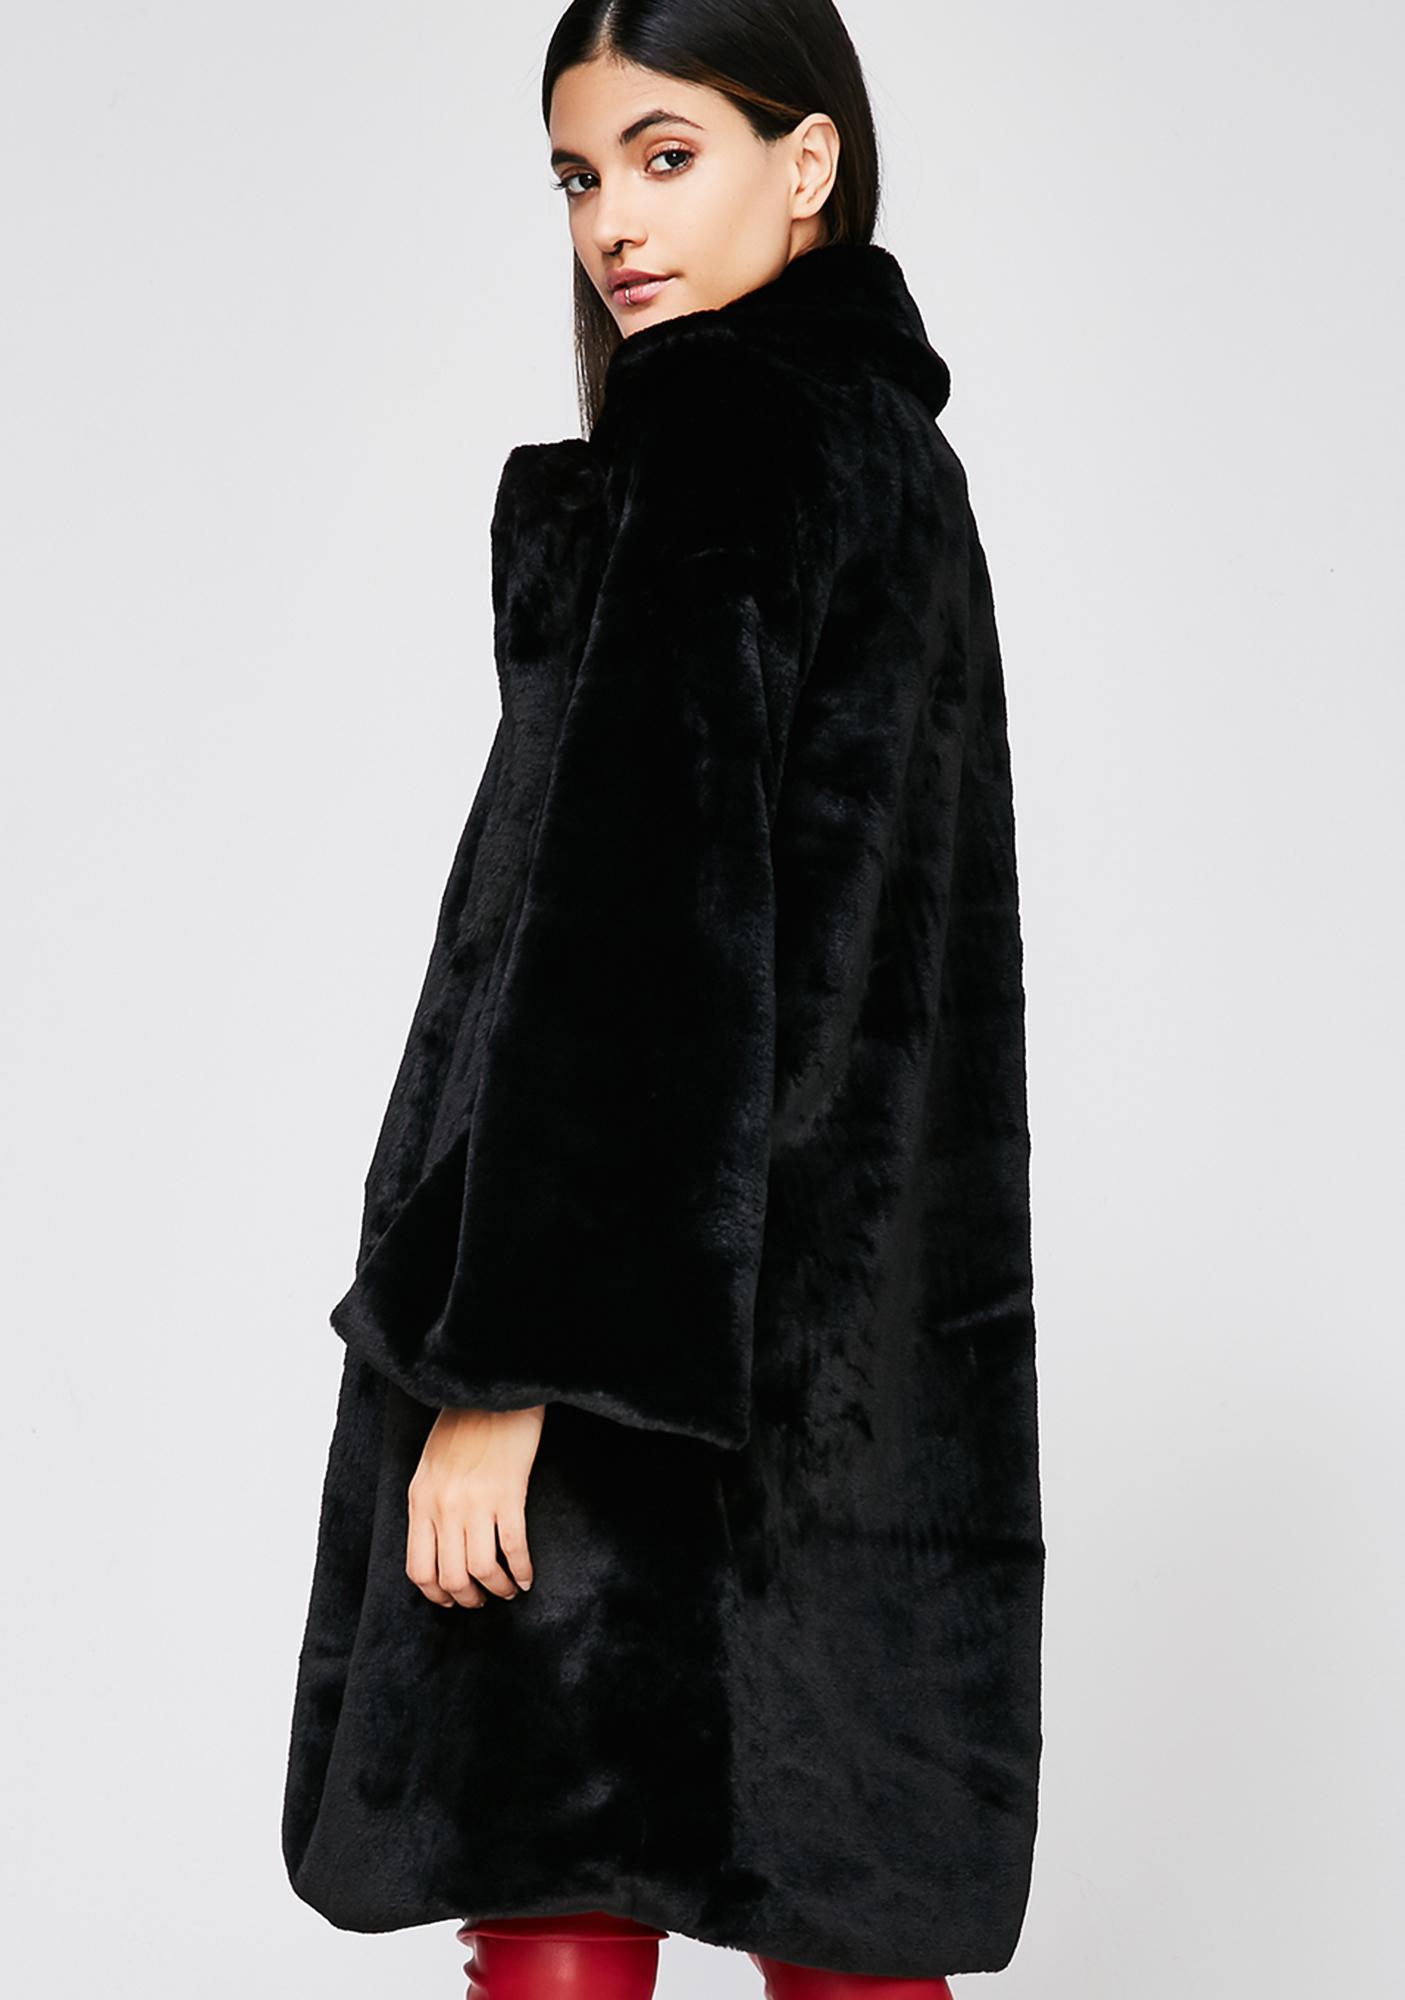 Furever Yours Furry Jacket